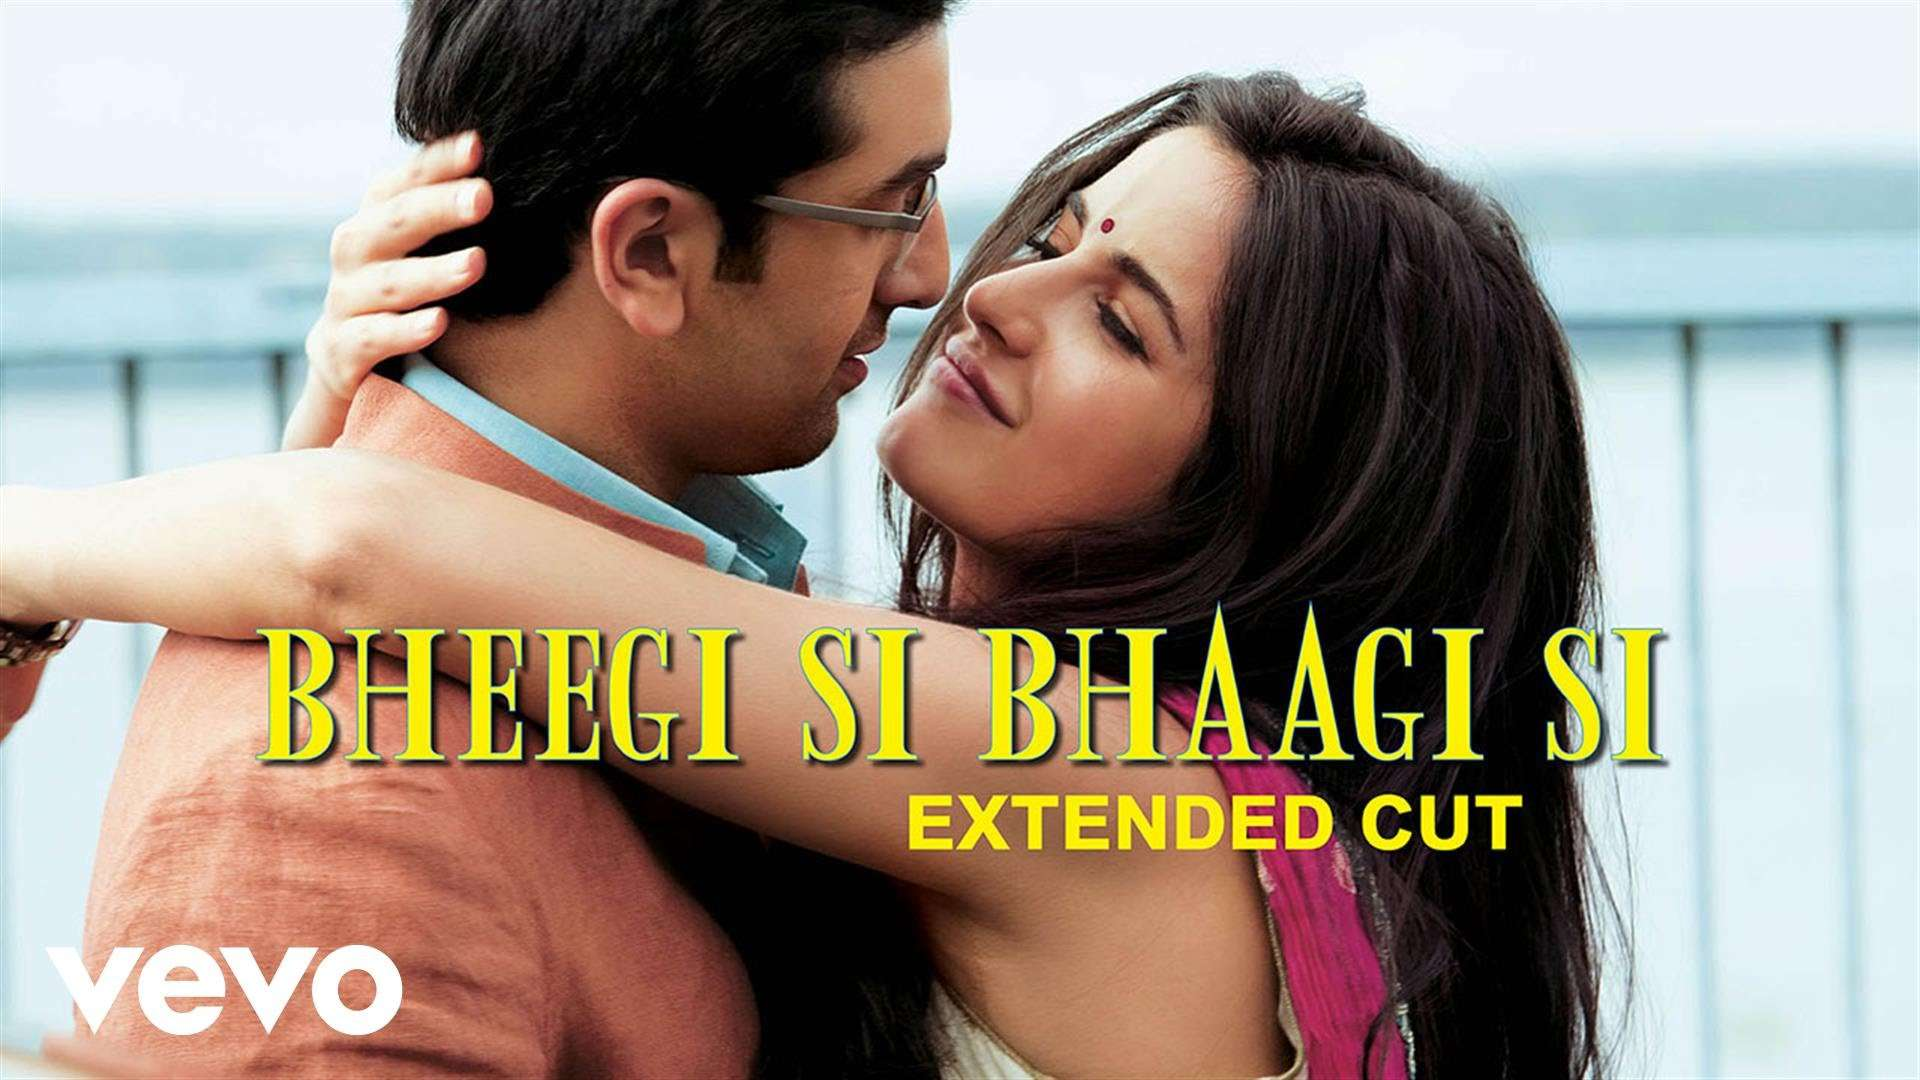 Hindi Song Bheegi Si Bhaagi Si Sung By Mohit Chauhan